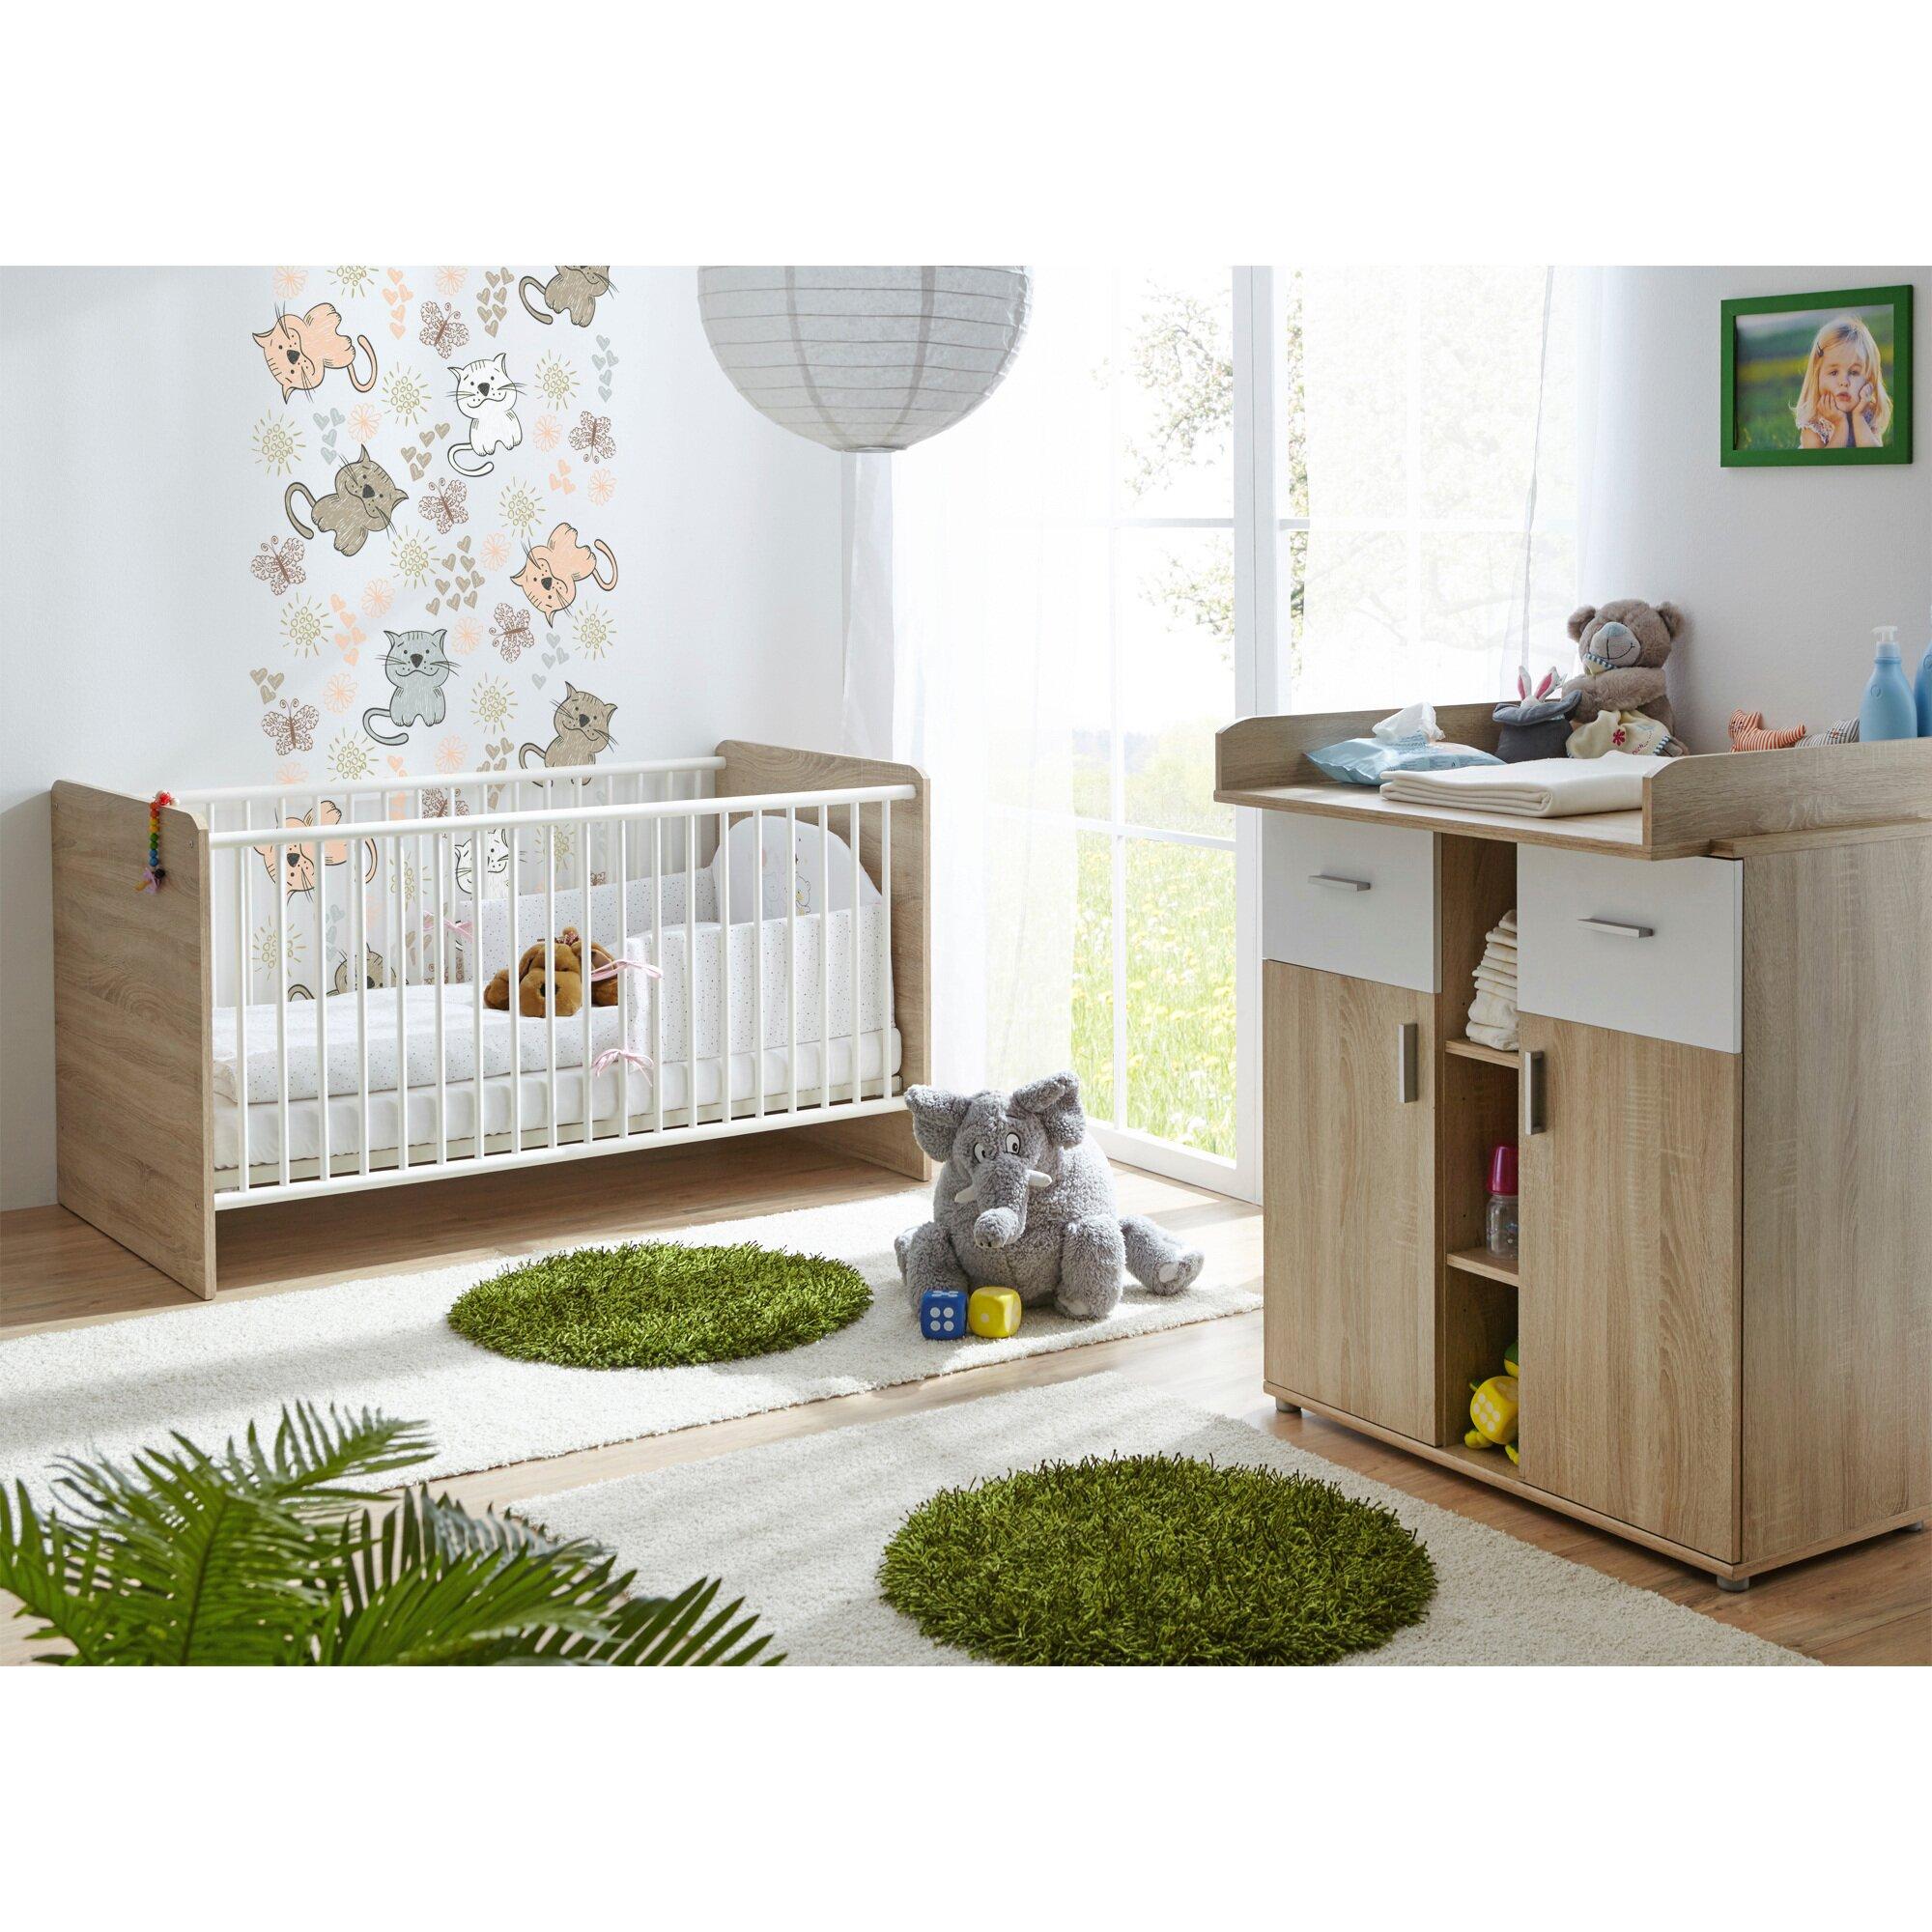 ticaa-3-tlg-babyzimmer-nico, 449.00 EUR @ babywalz-de